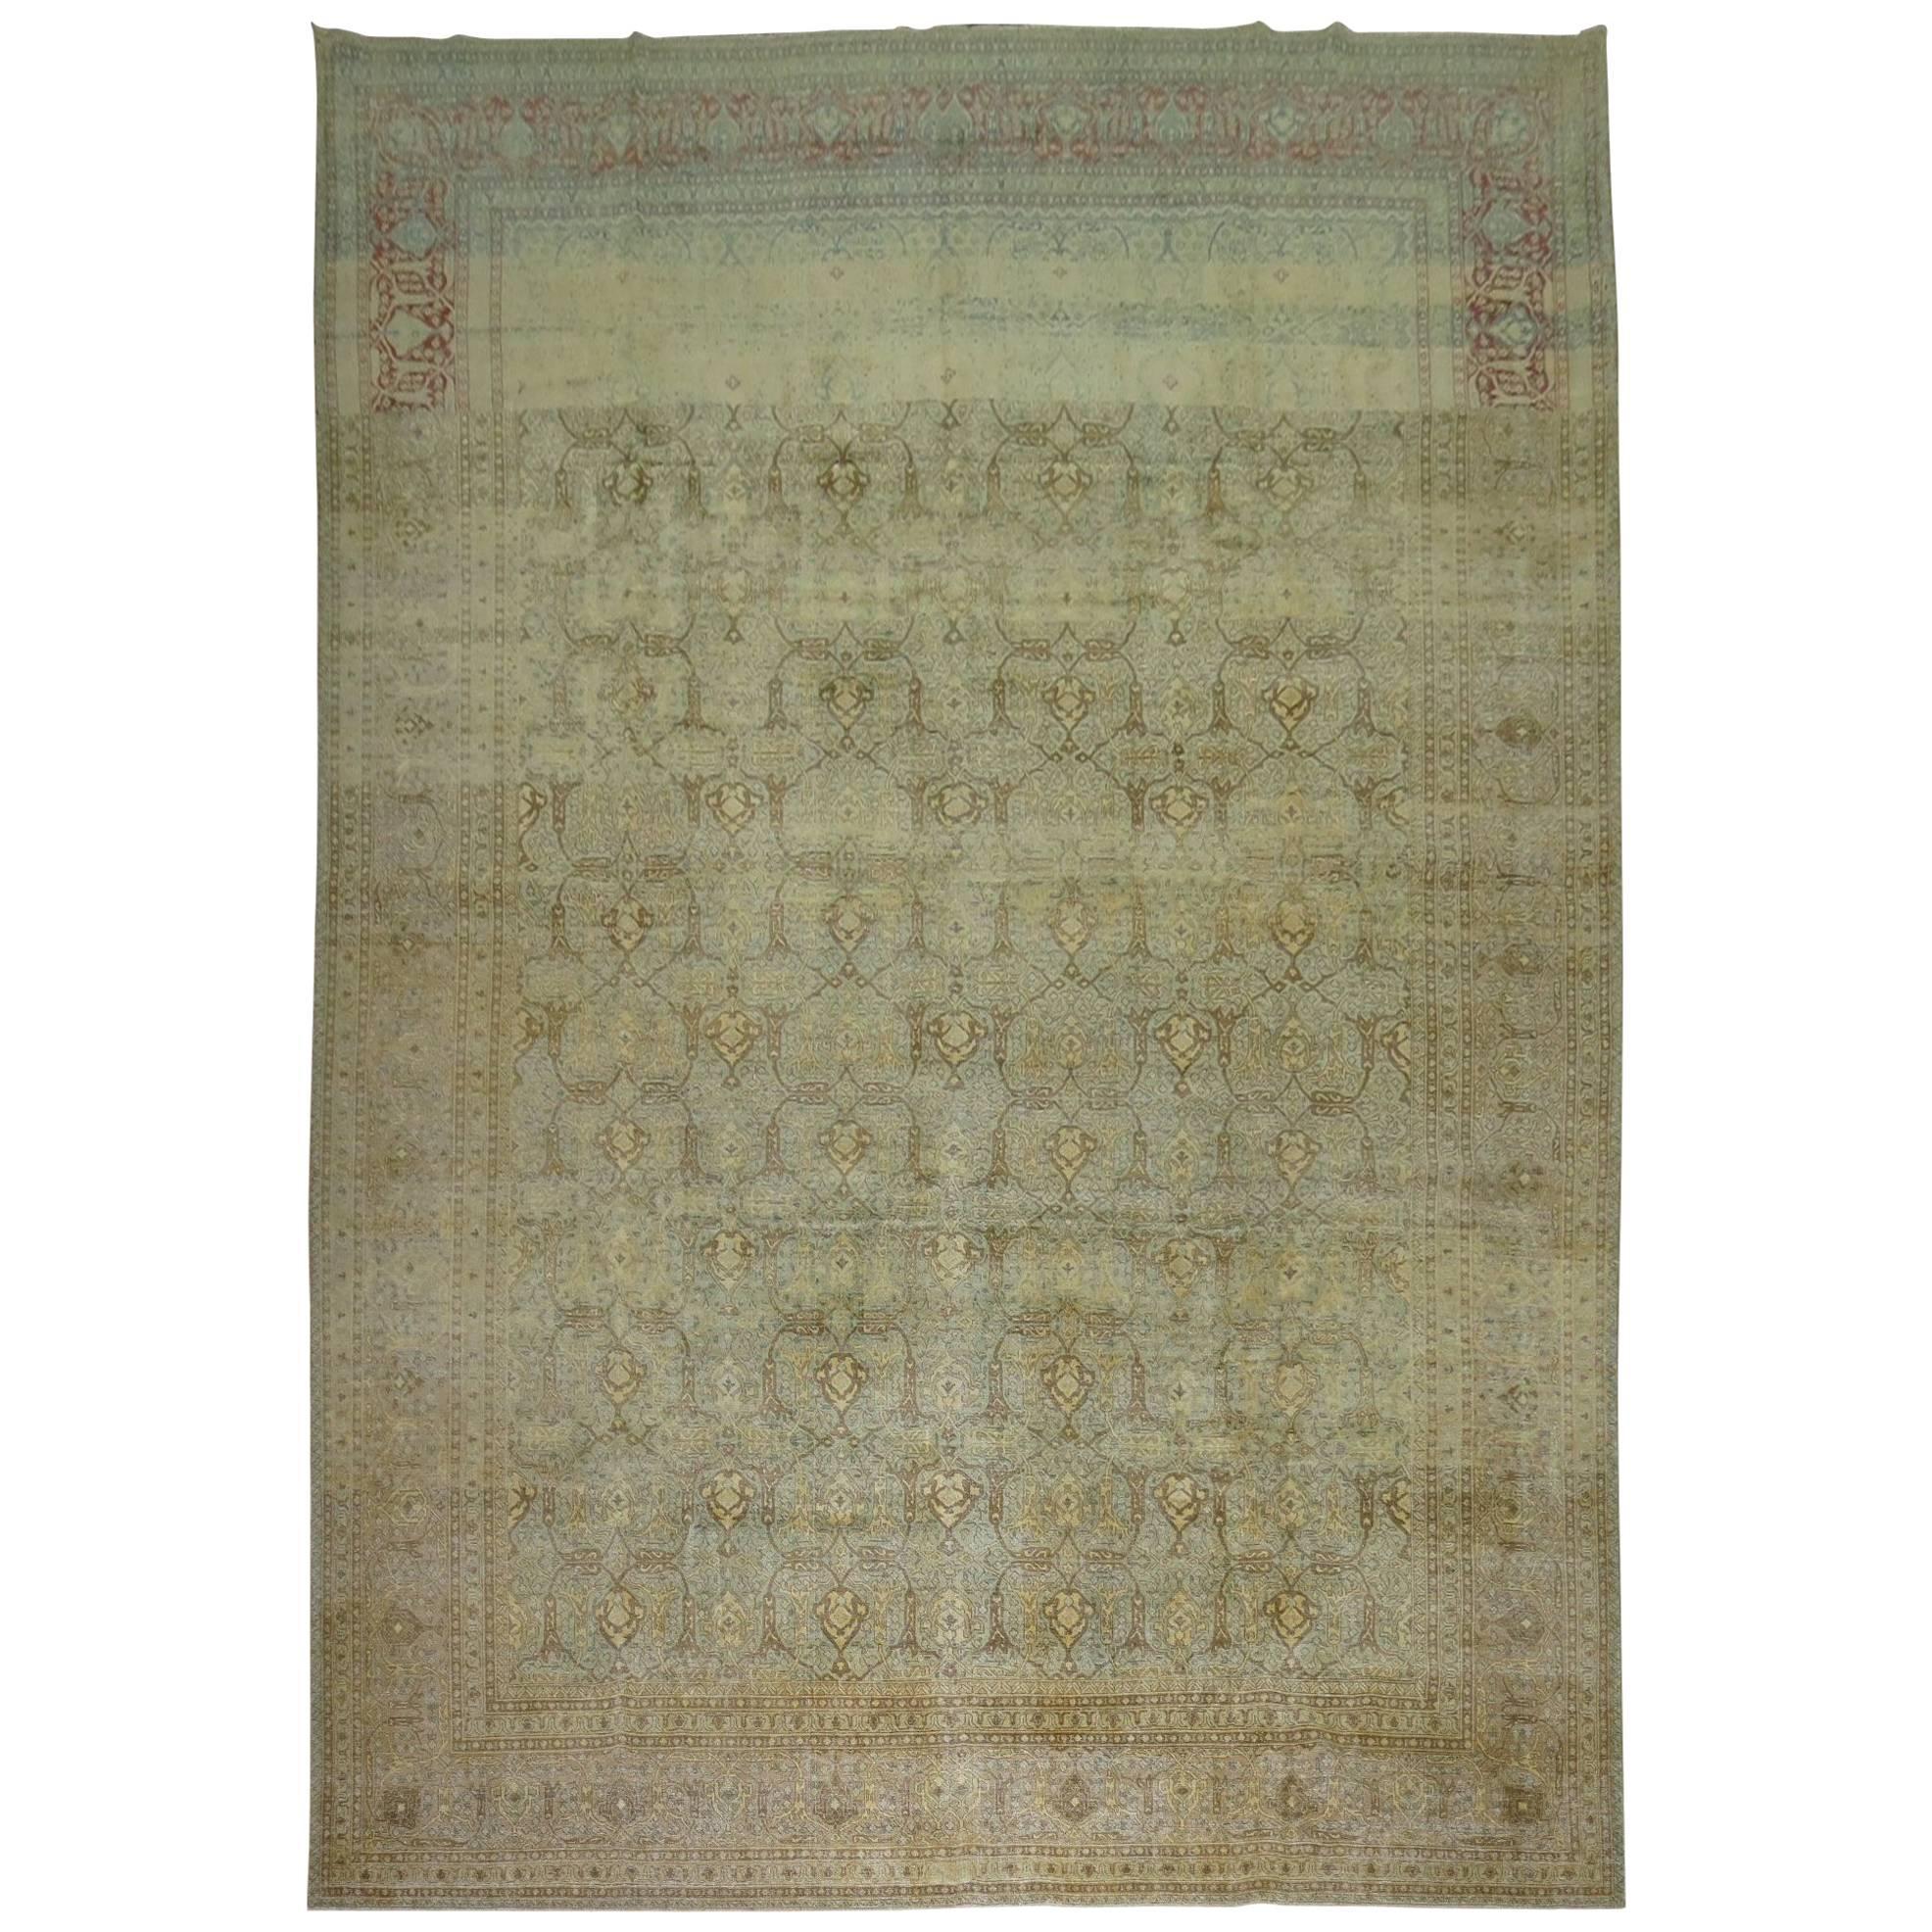 Antique Persian Isfahan Carpet